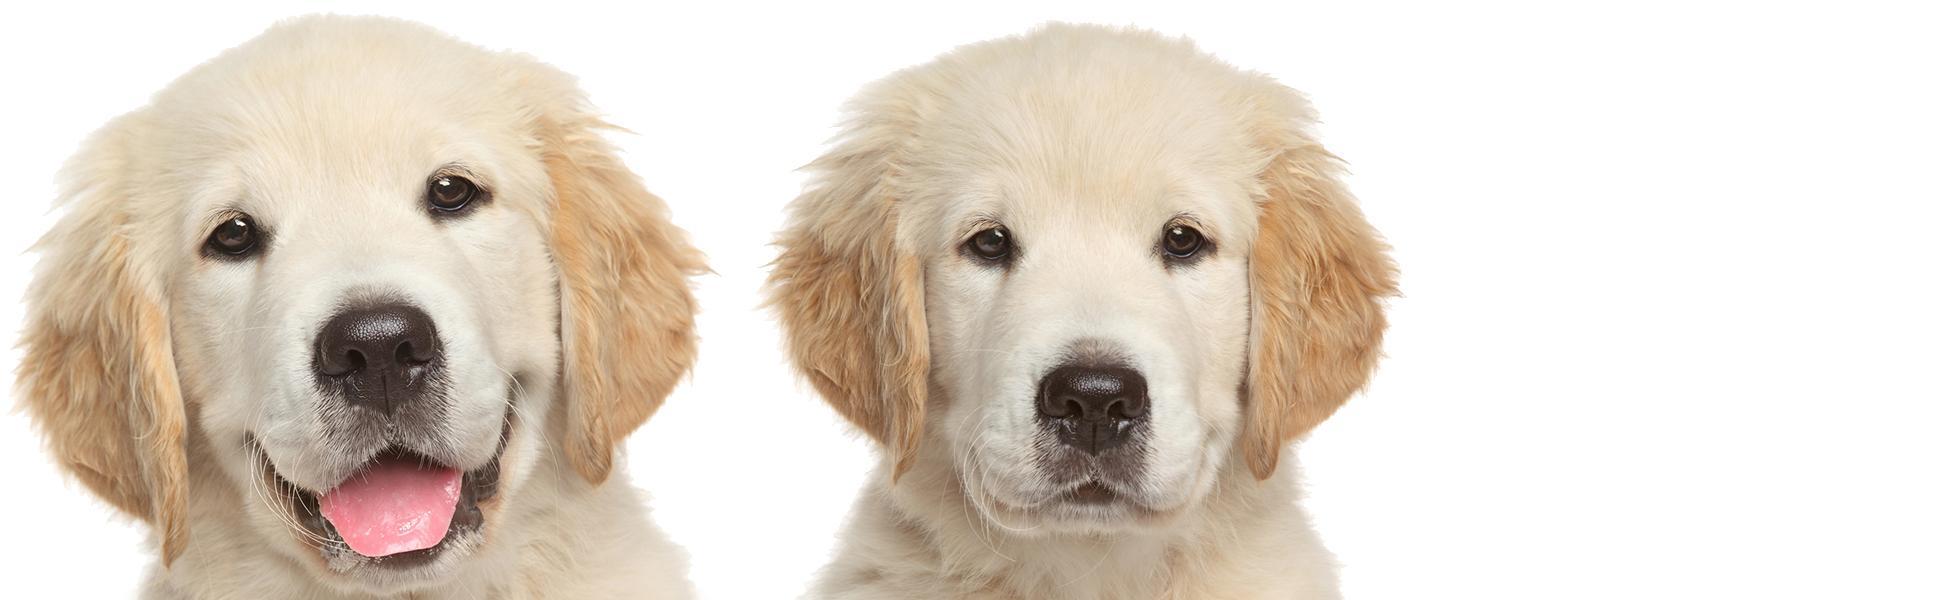 Amazon Com The Blissful Dog Golden Retriever Nose Butter 2 Ounce